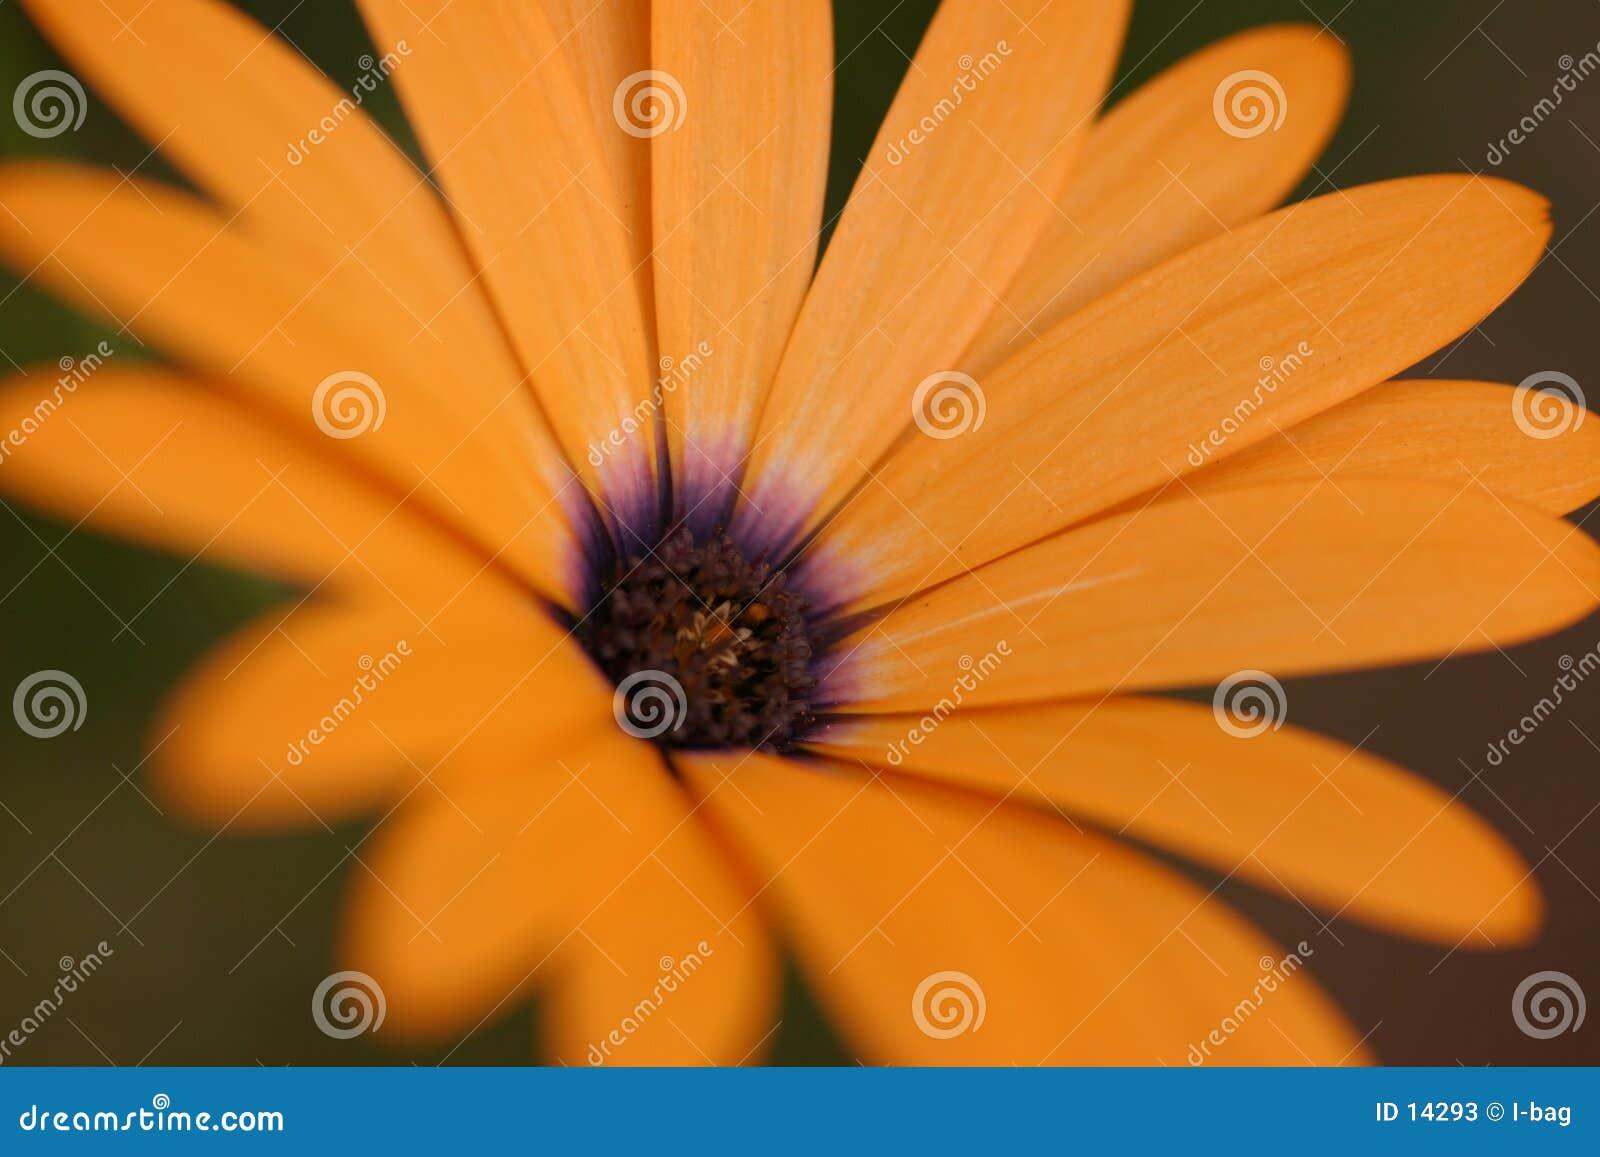 Flor anaranjado de la flor